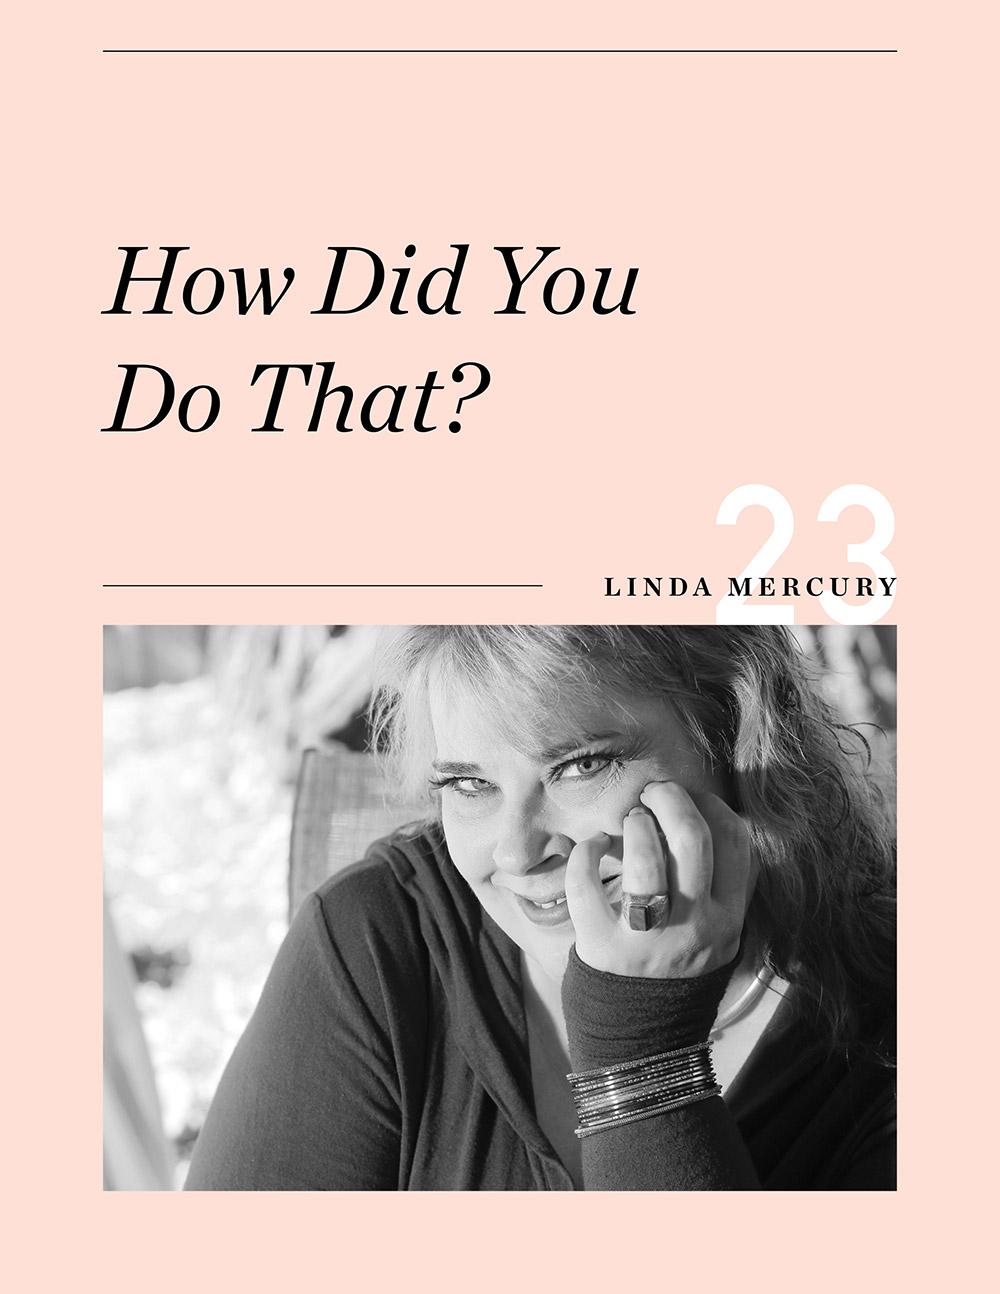 Ellen Fondiler | An Interview with Linda Mercury